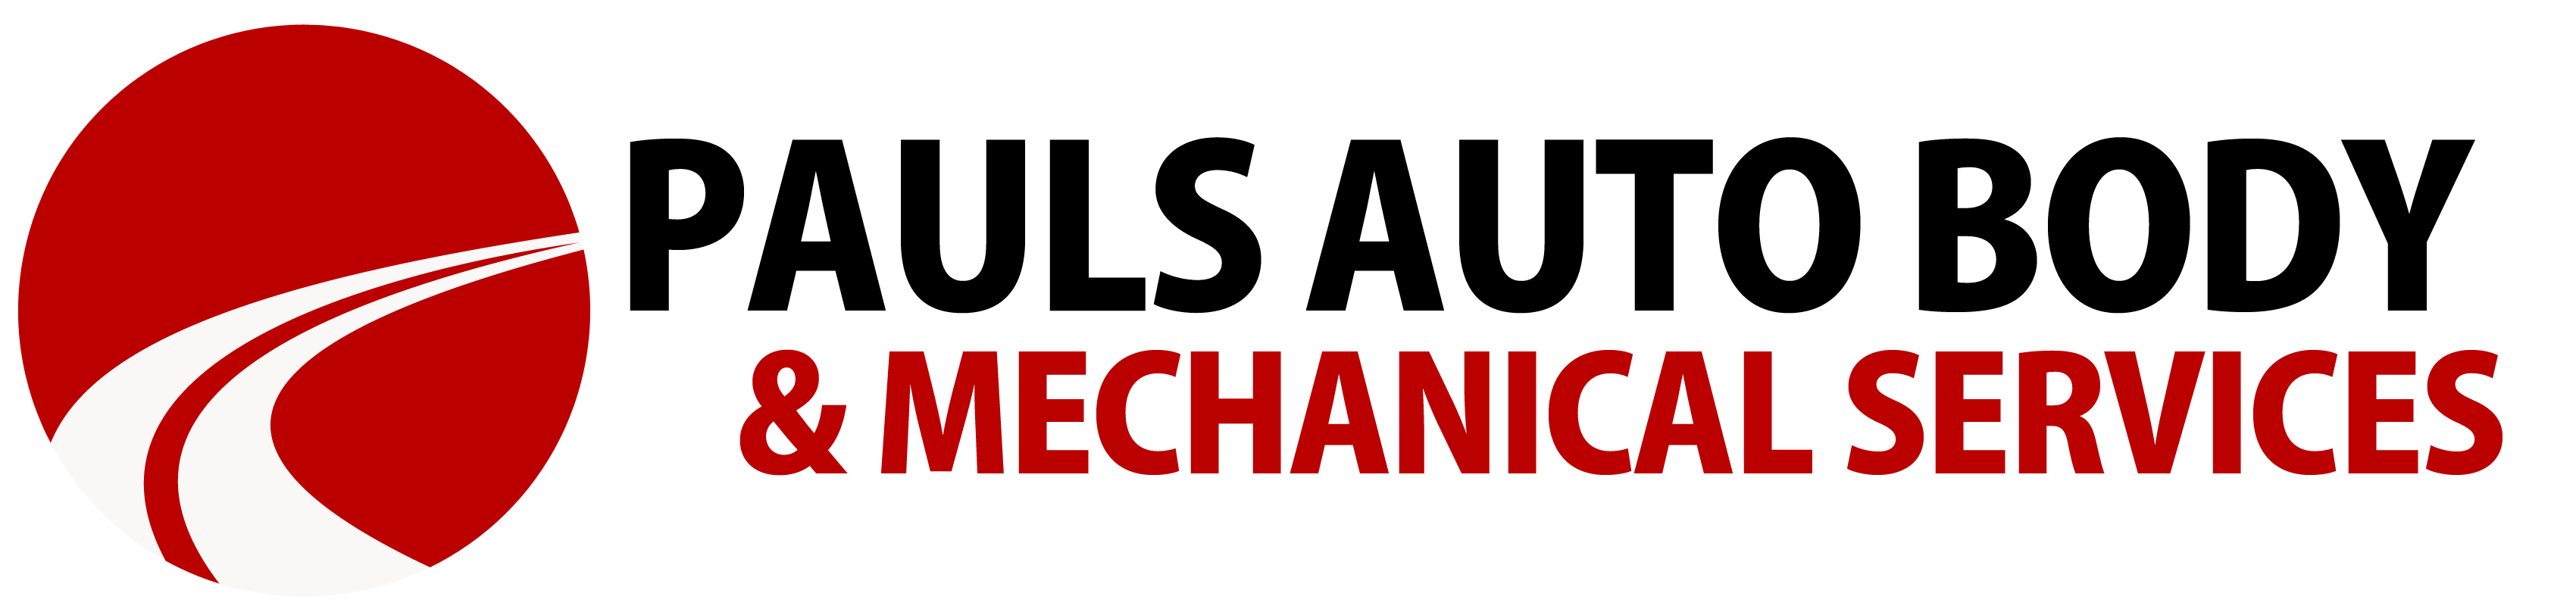 Pauls auto body glass. Mechanic clipart logo